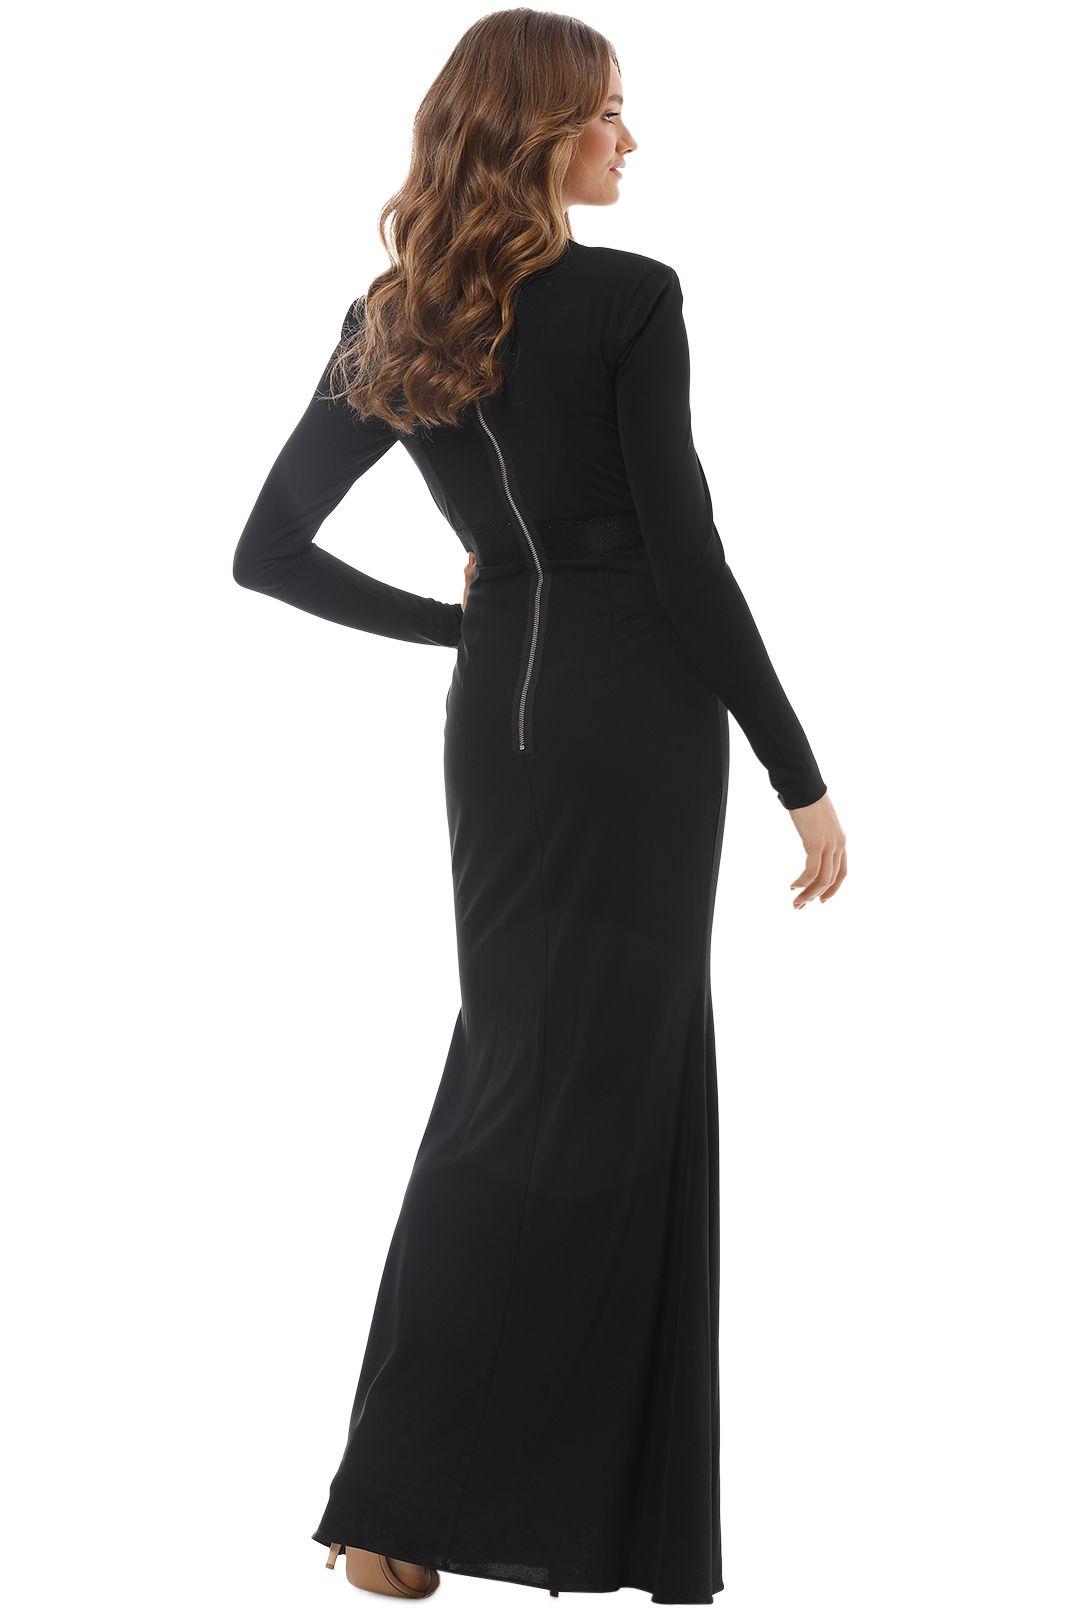 Alex Perry - Nadine V Long Sleeve Gown - Black - Back